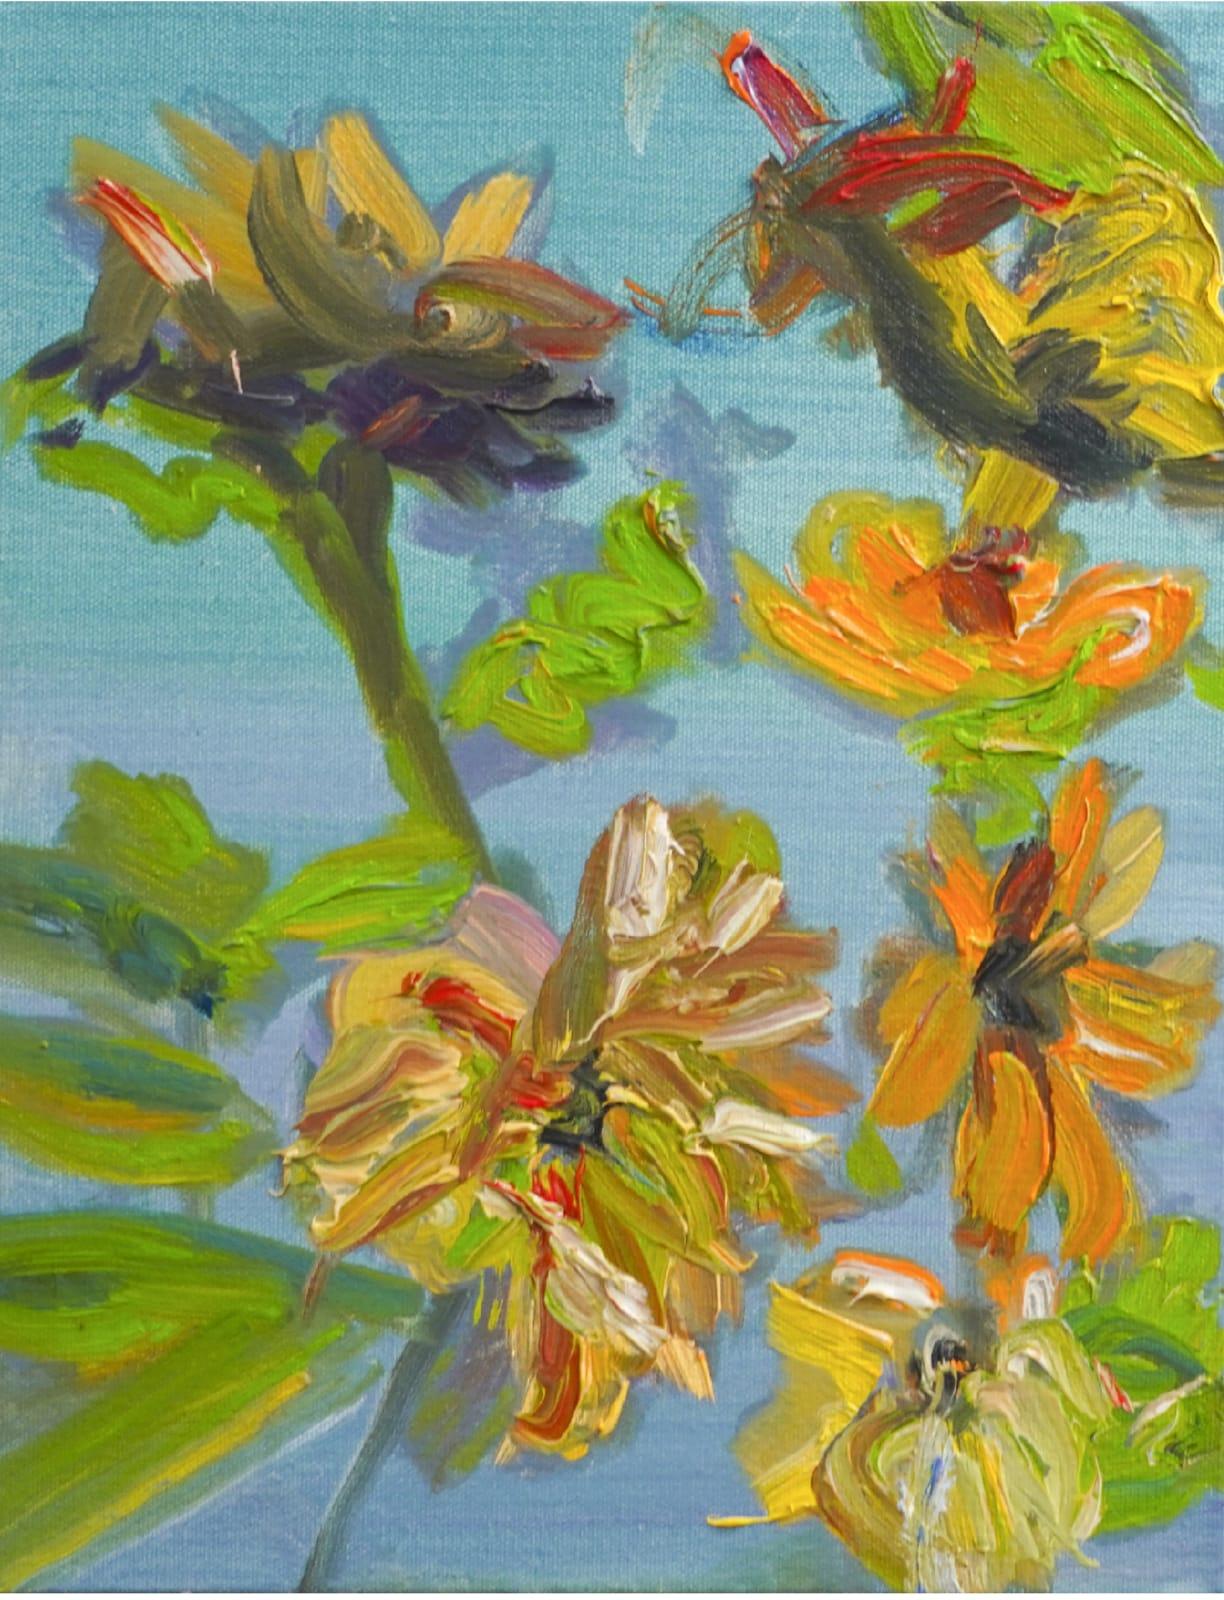 Pamela Davis Kivelson, #23 Angry Sunflowers 2, 2020